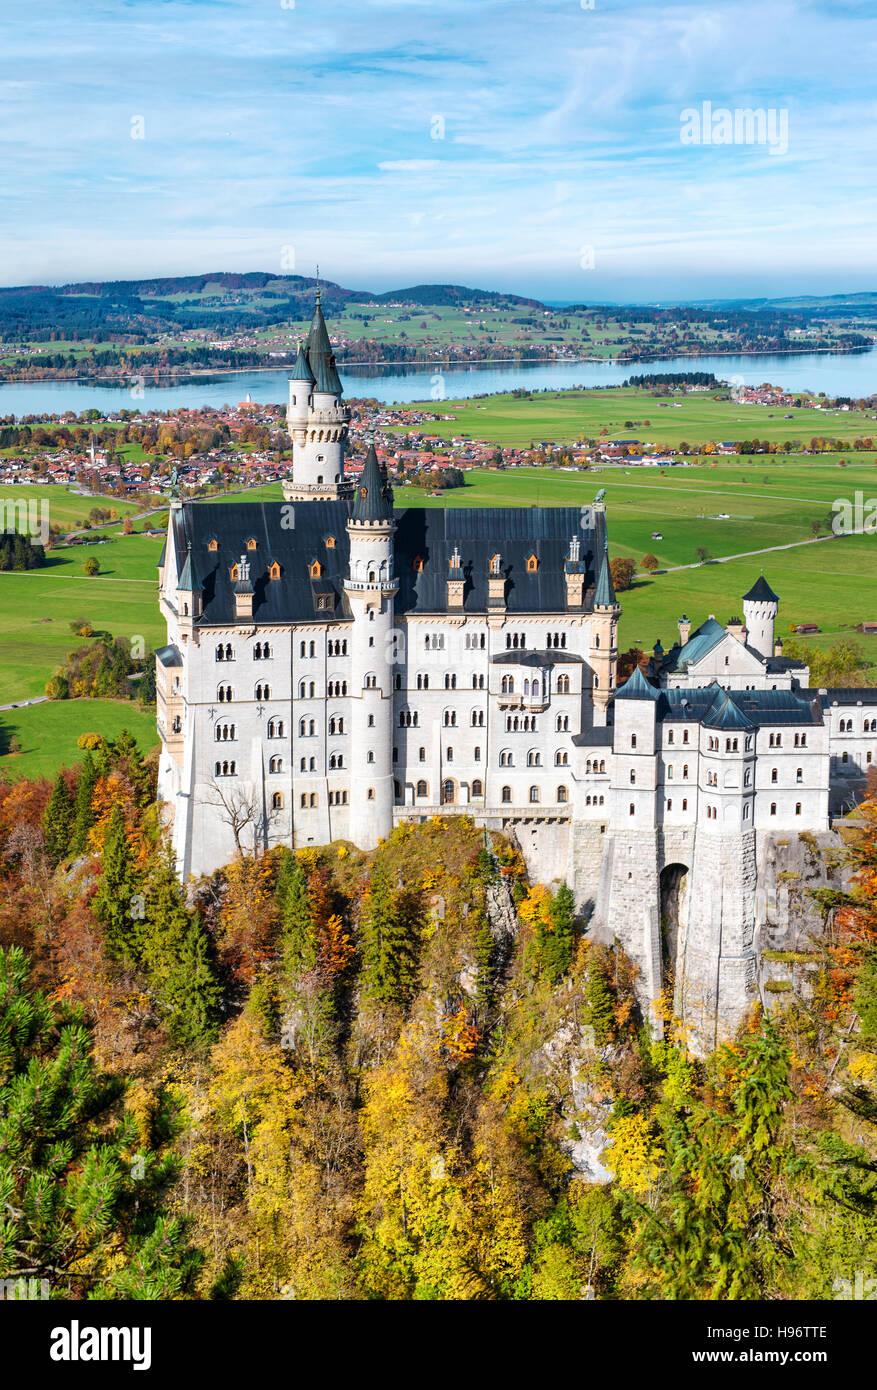 Famoso Castillo Neuschwanstein en otoño. Alemania, Baviera. Hermoso paisaje alemán Imagen De Stock